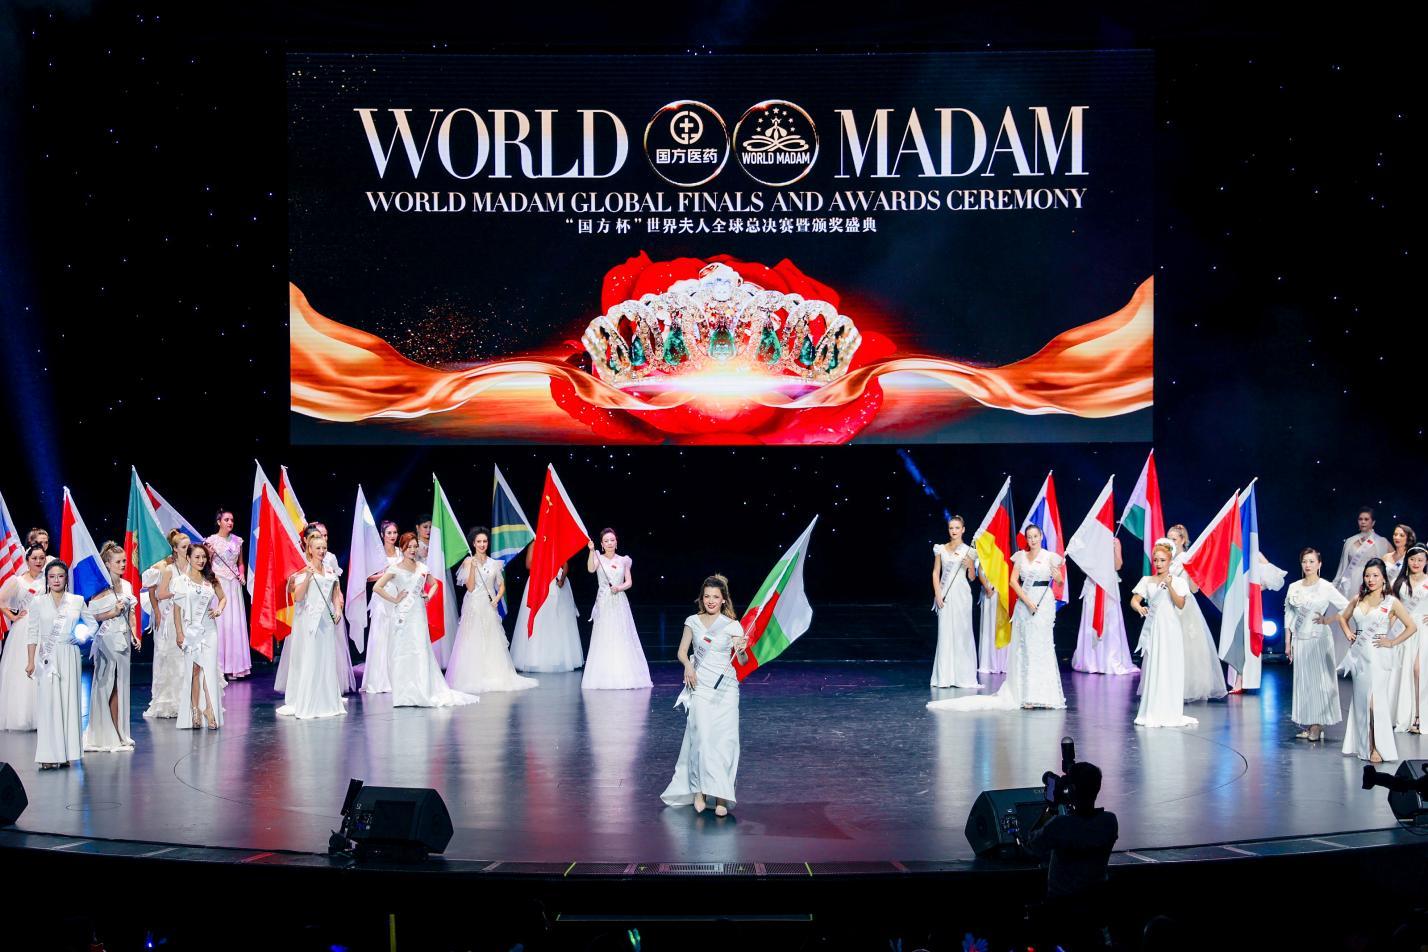 2021WORLD MADAM世界夫人上海和广西总决赛圆满收官